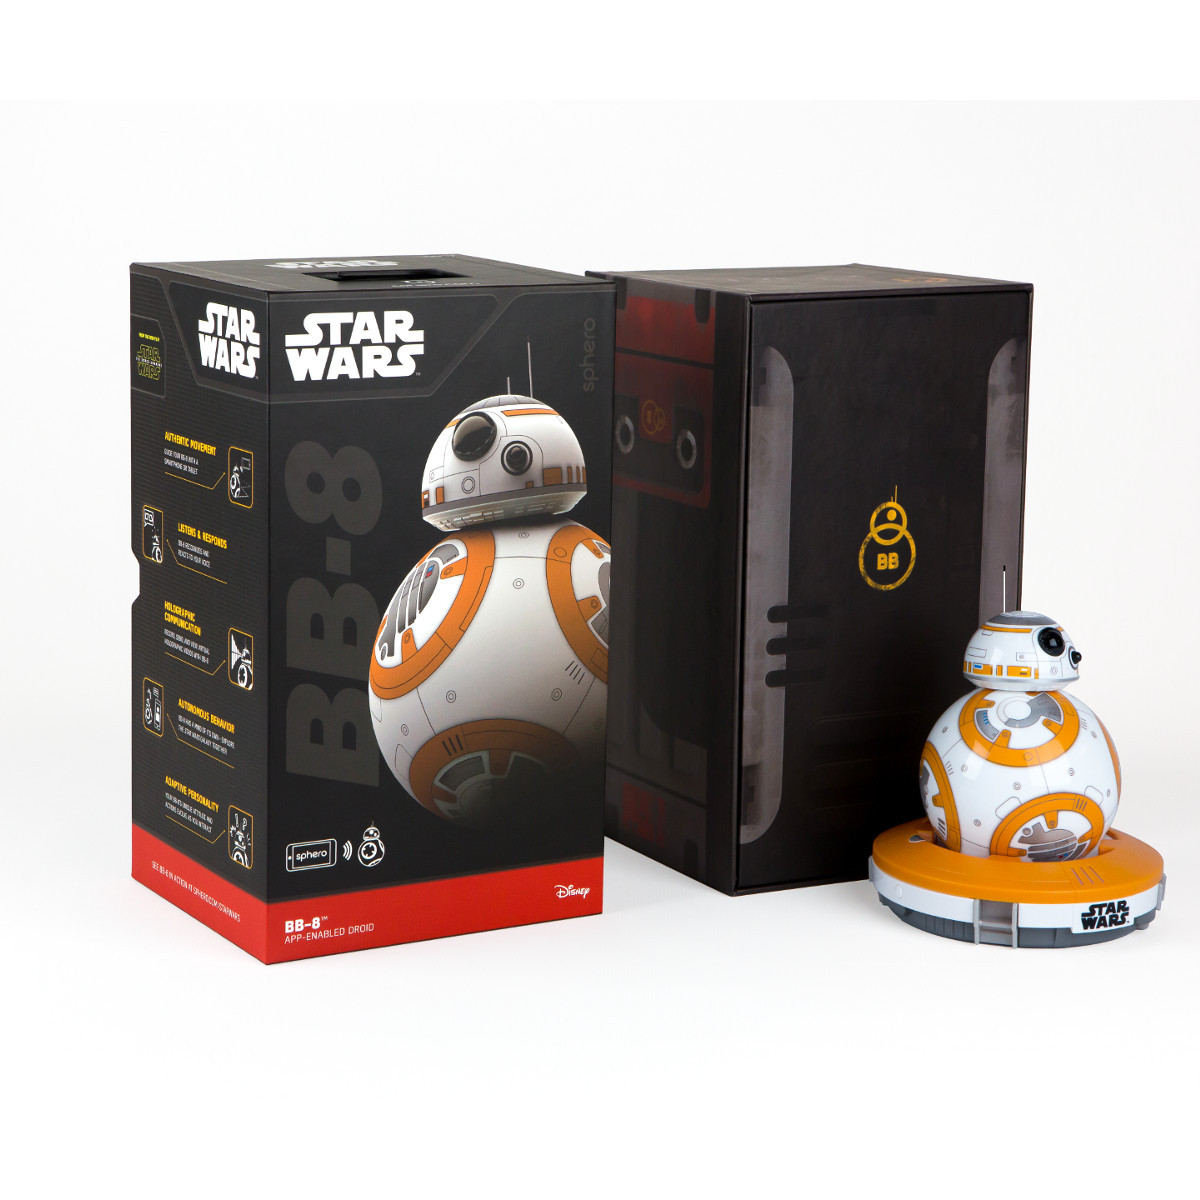 Star Wars BB-8 robot